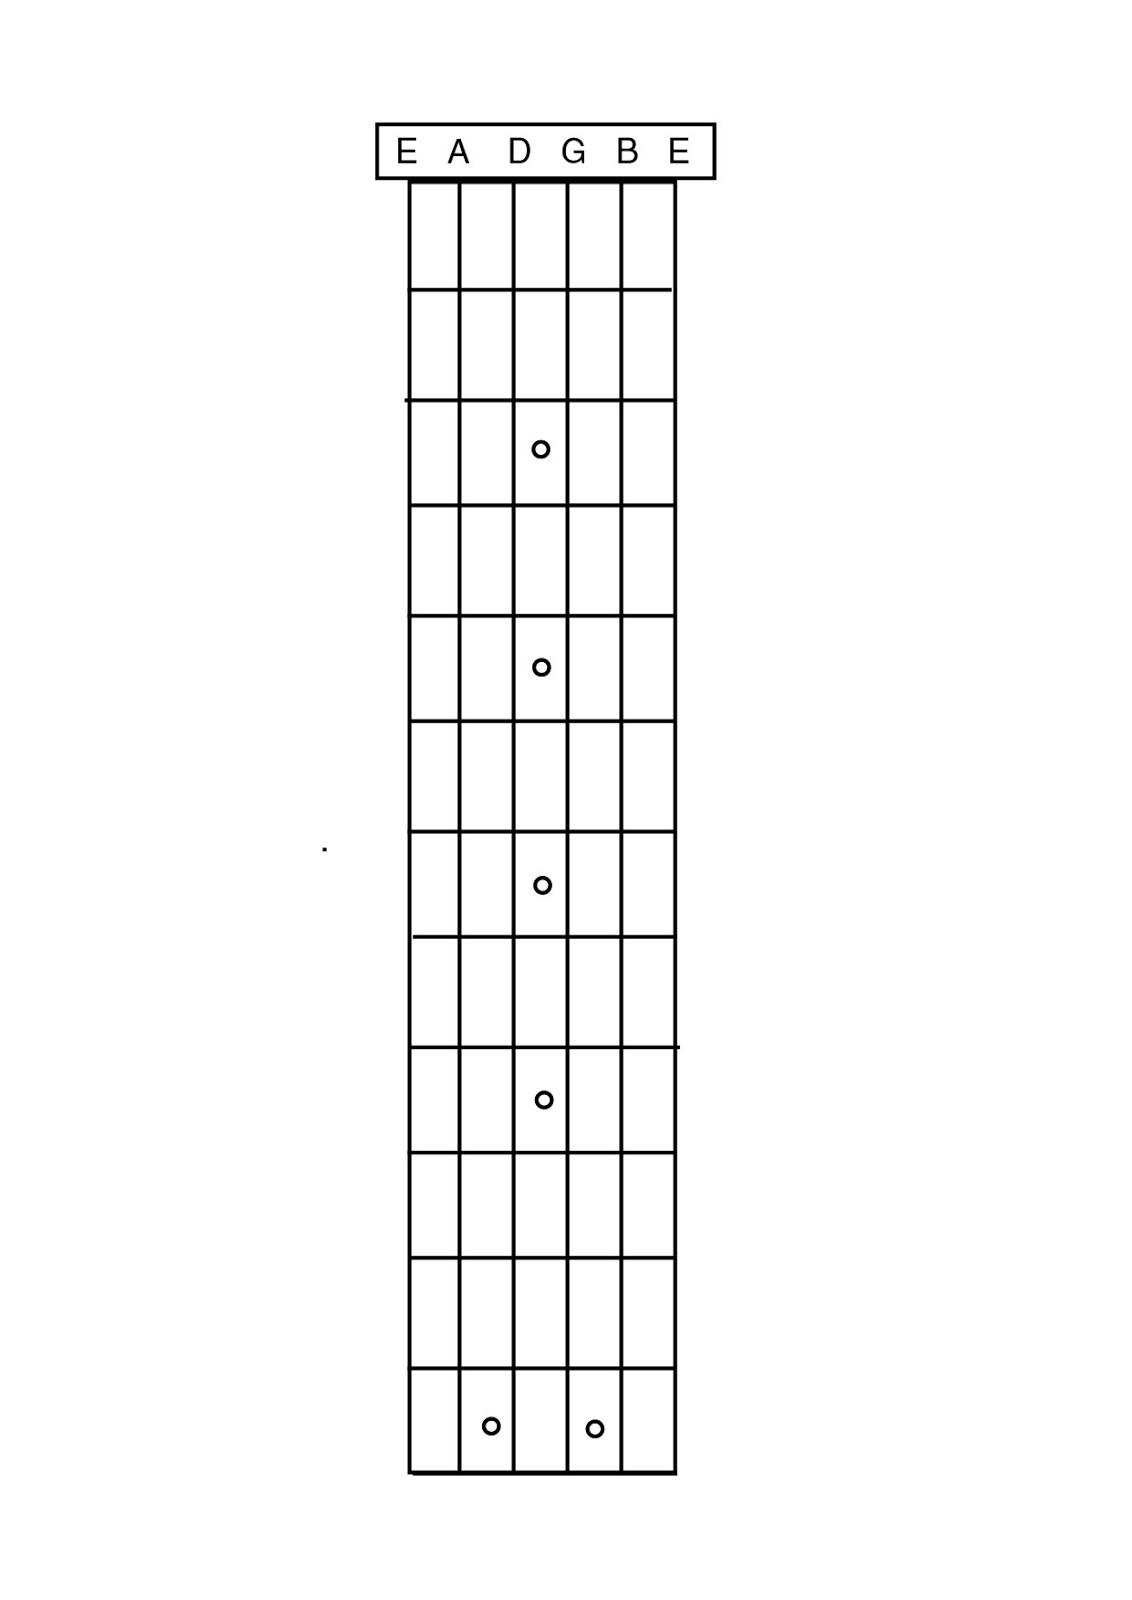 Blank Bass Sheet Print Outs